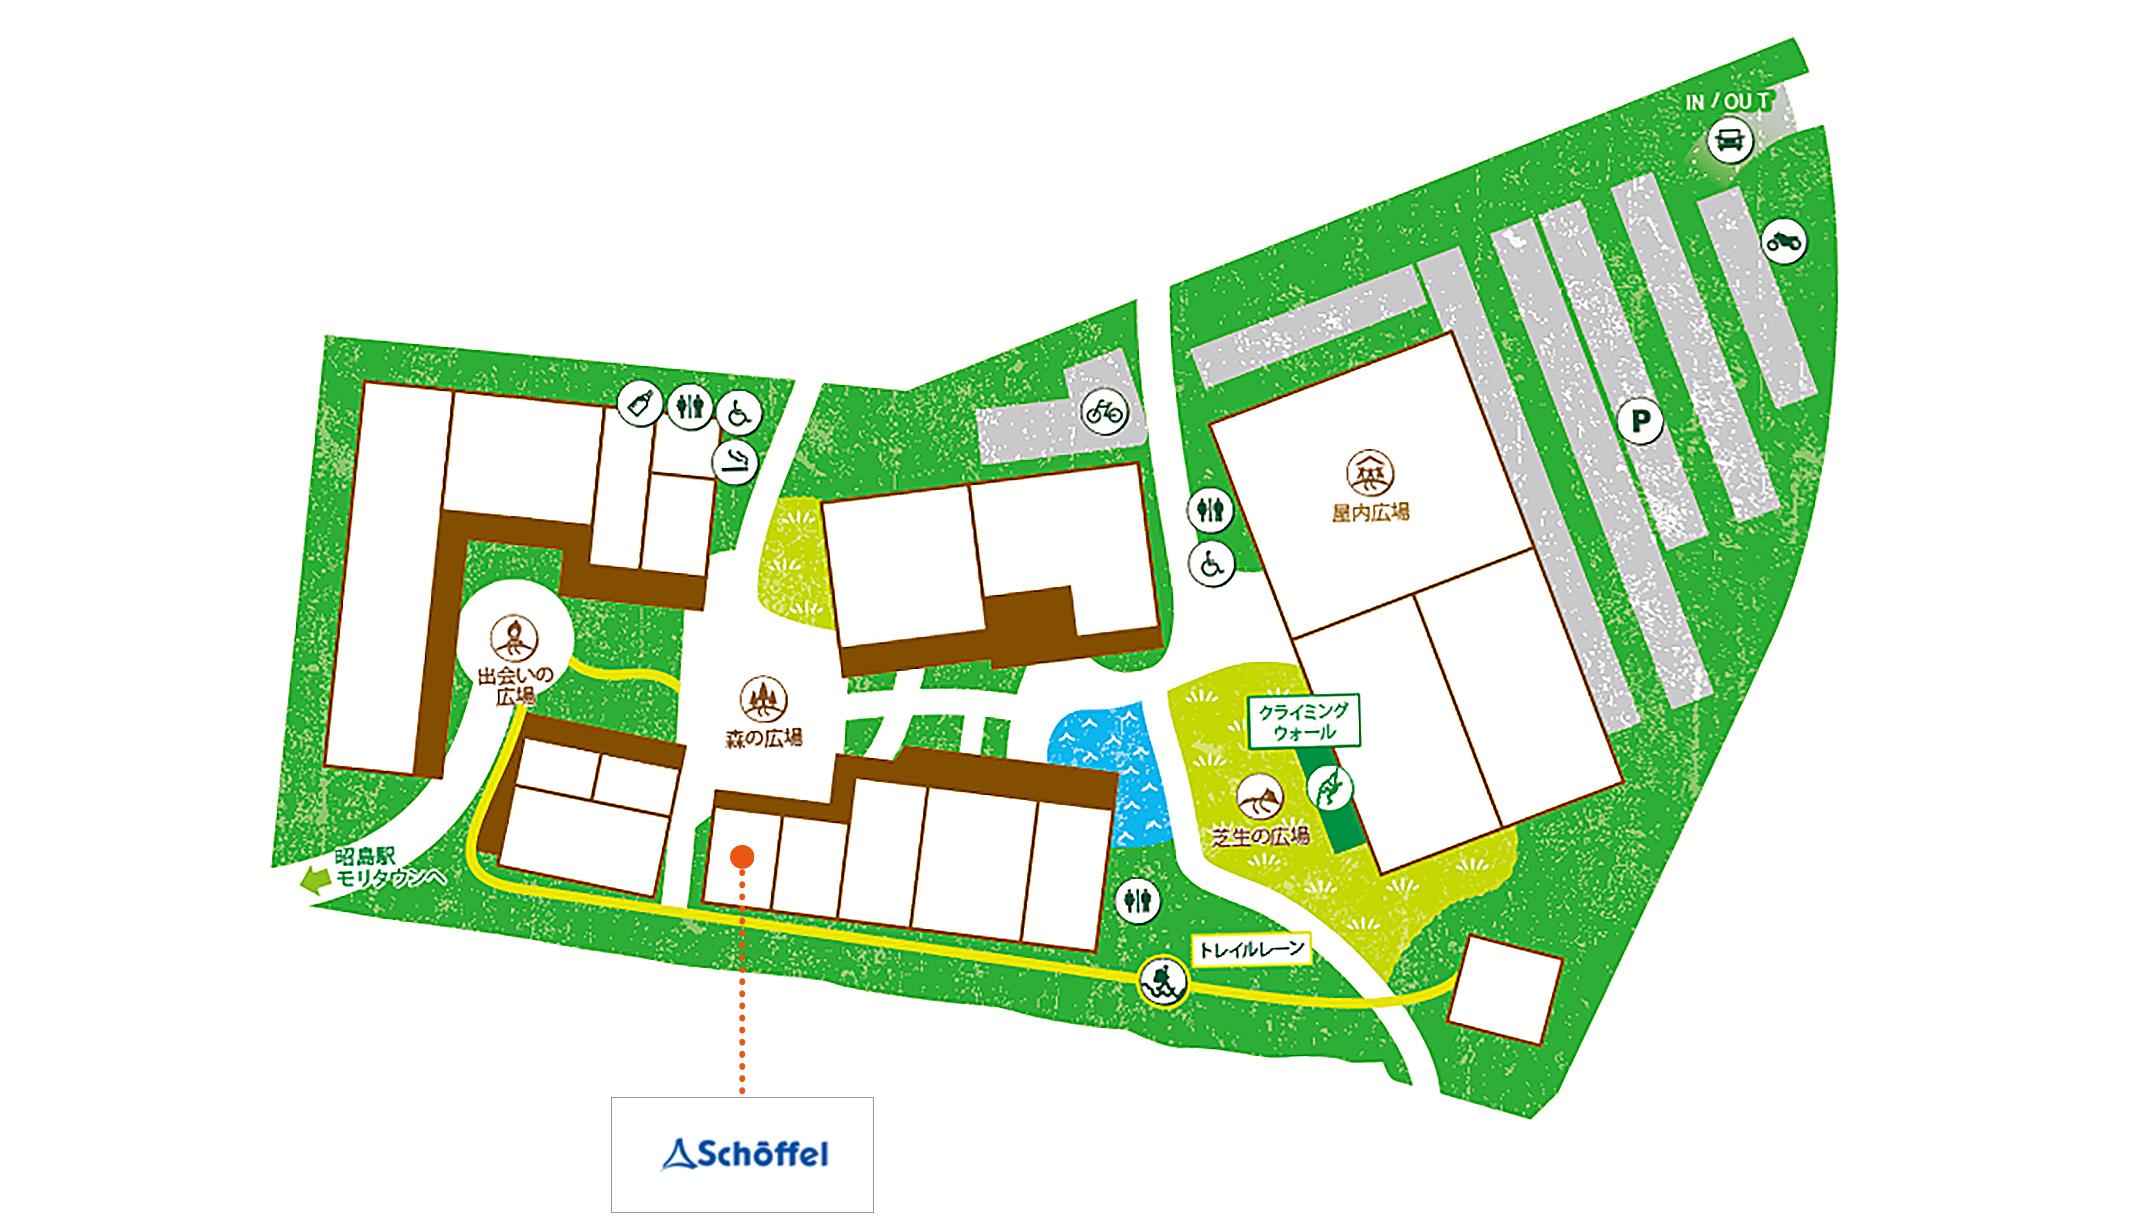 Schoffel 昭島アウトドアヴィレッジ店map